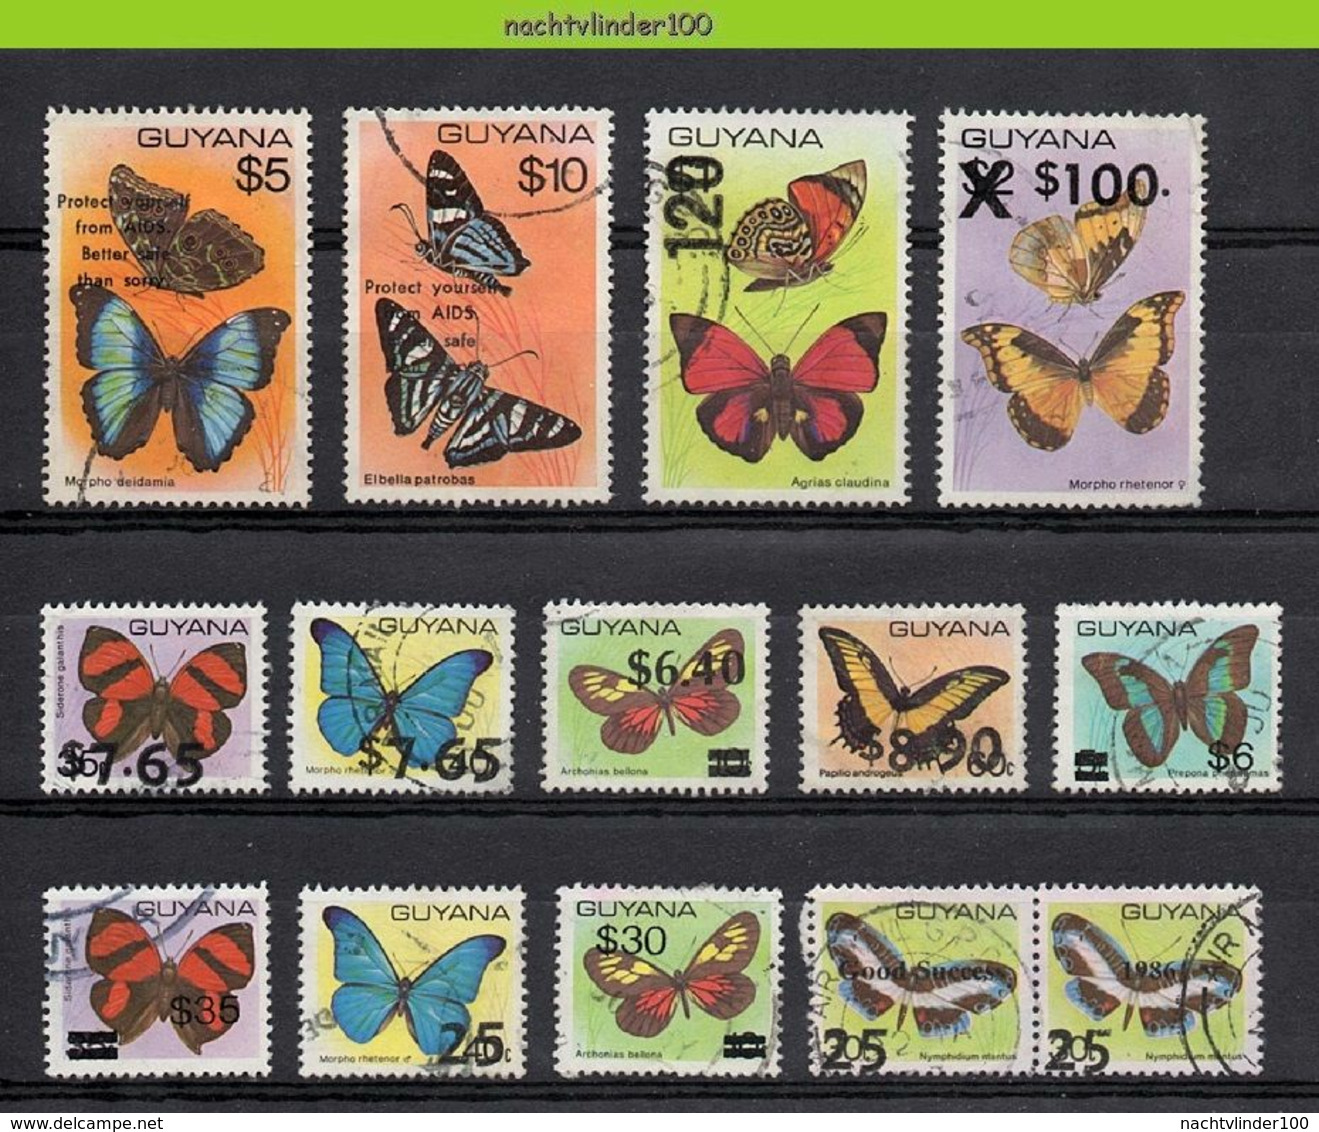 Mwe2751 FAUNA VLINDERS * OPDRUK OVERPRINT * BUTTERFLIES SCHMETTERLINGE MARIPOSAS PAPILLONS GUYANA Gebr/used - Butterflies